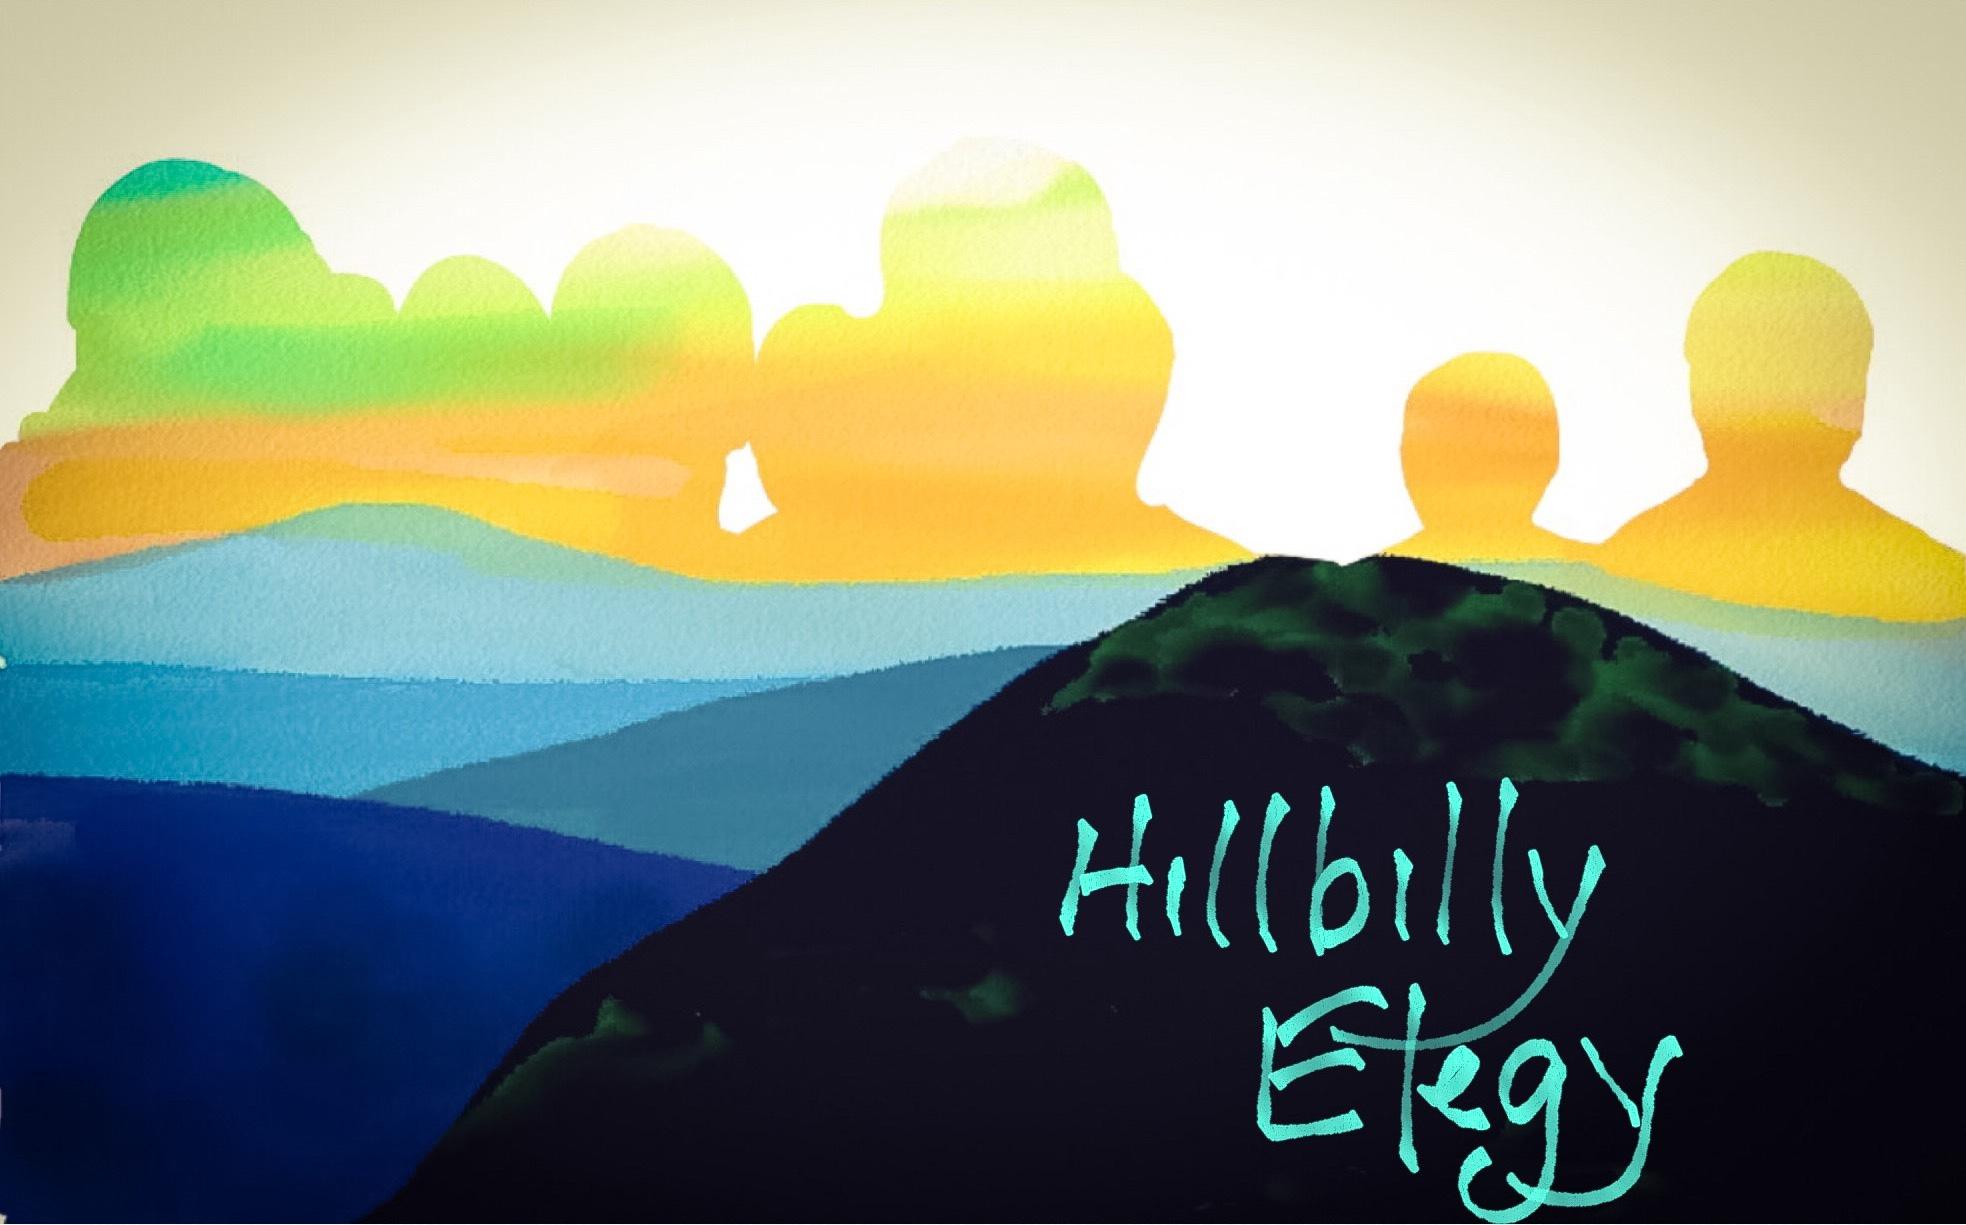 Hillbilly Elegy - the book